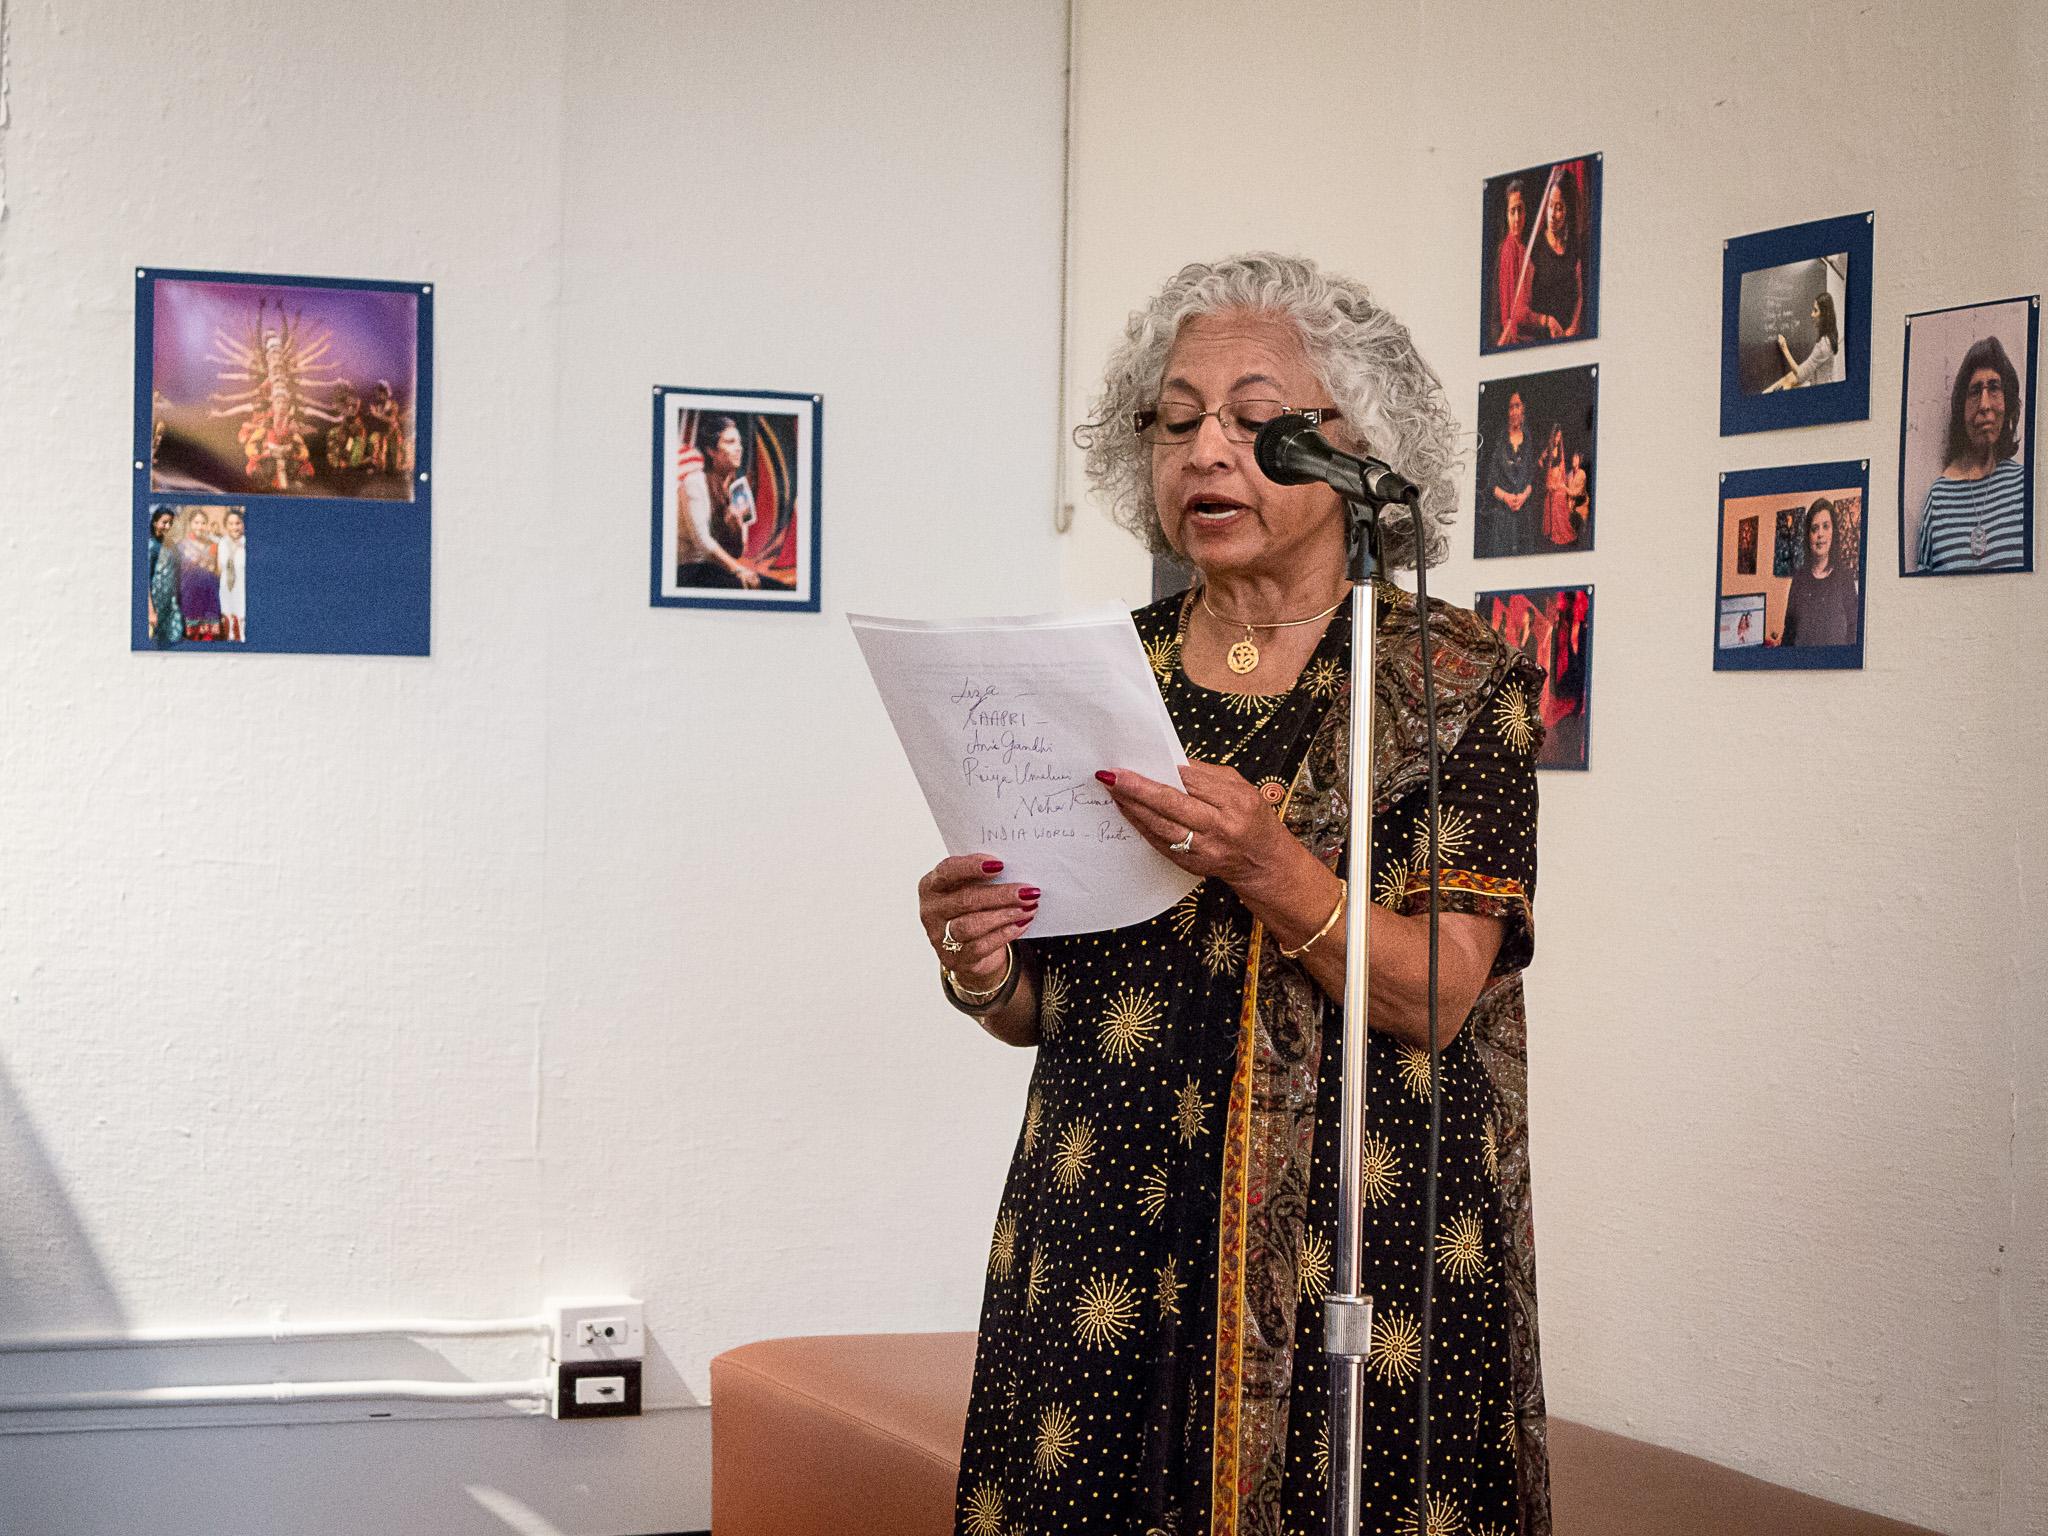 Shakuntala Rajagopal at festival reception